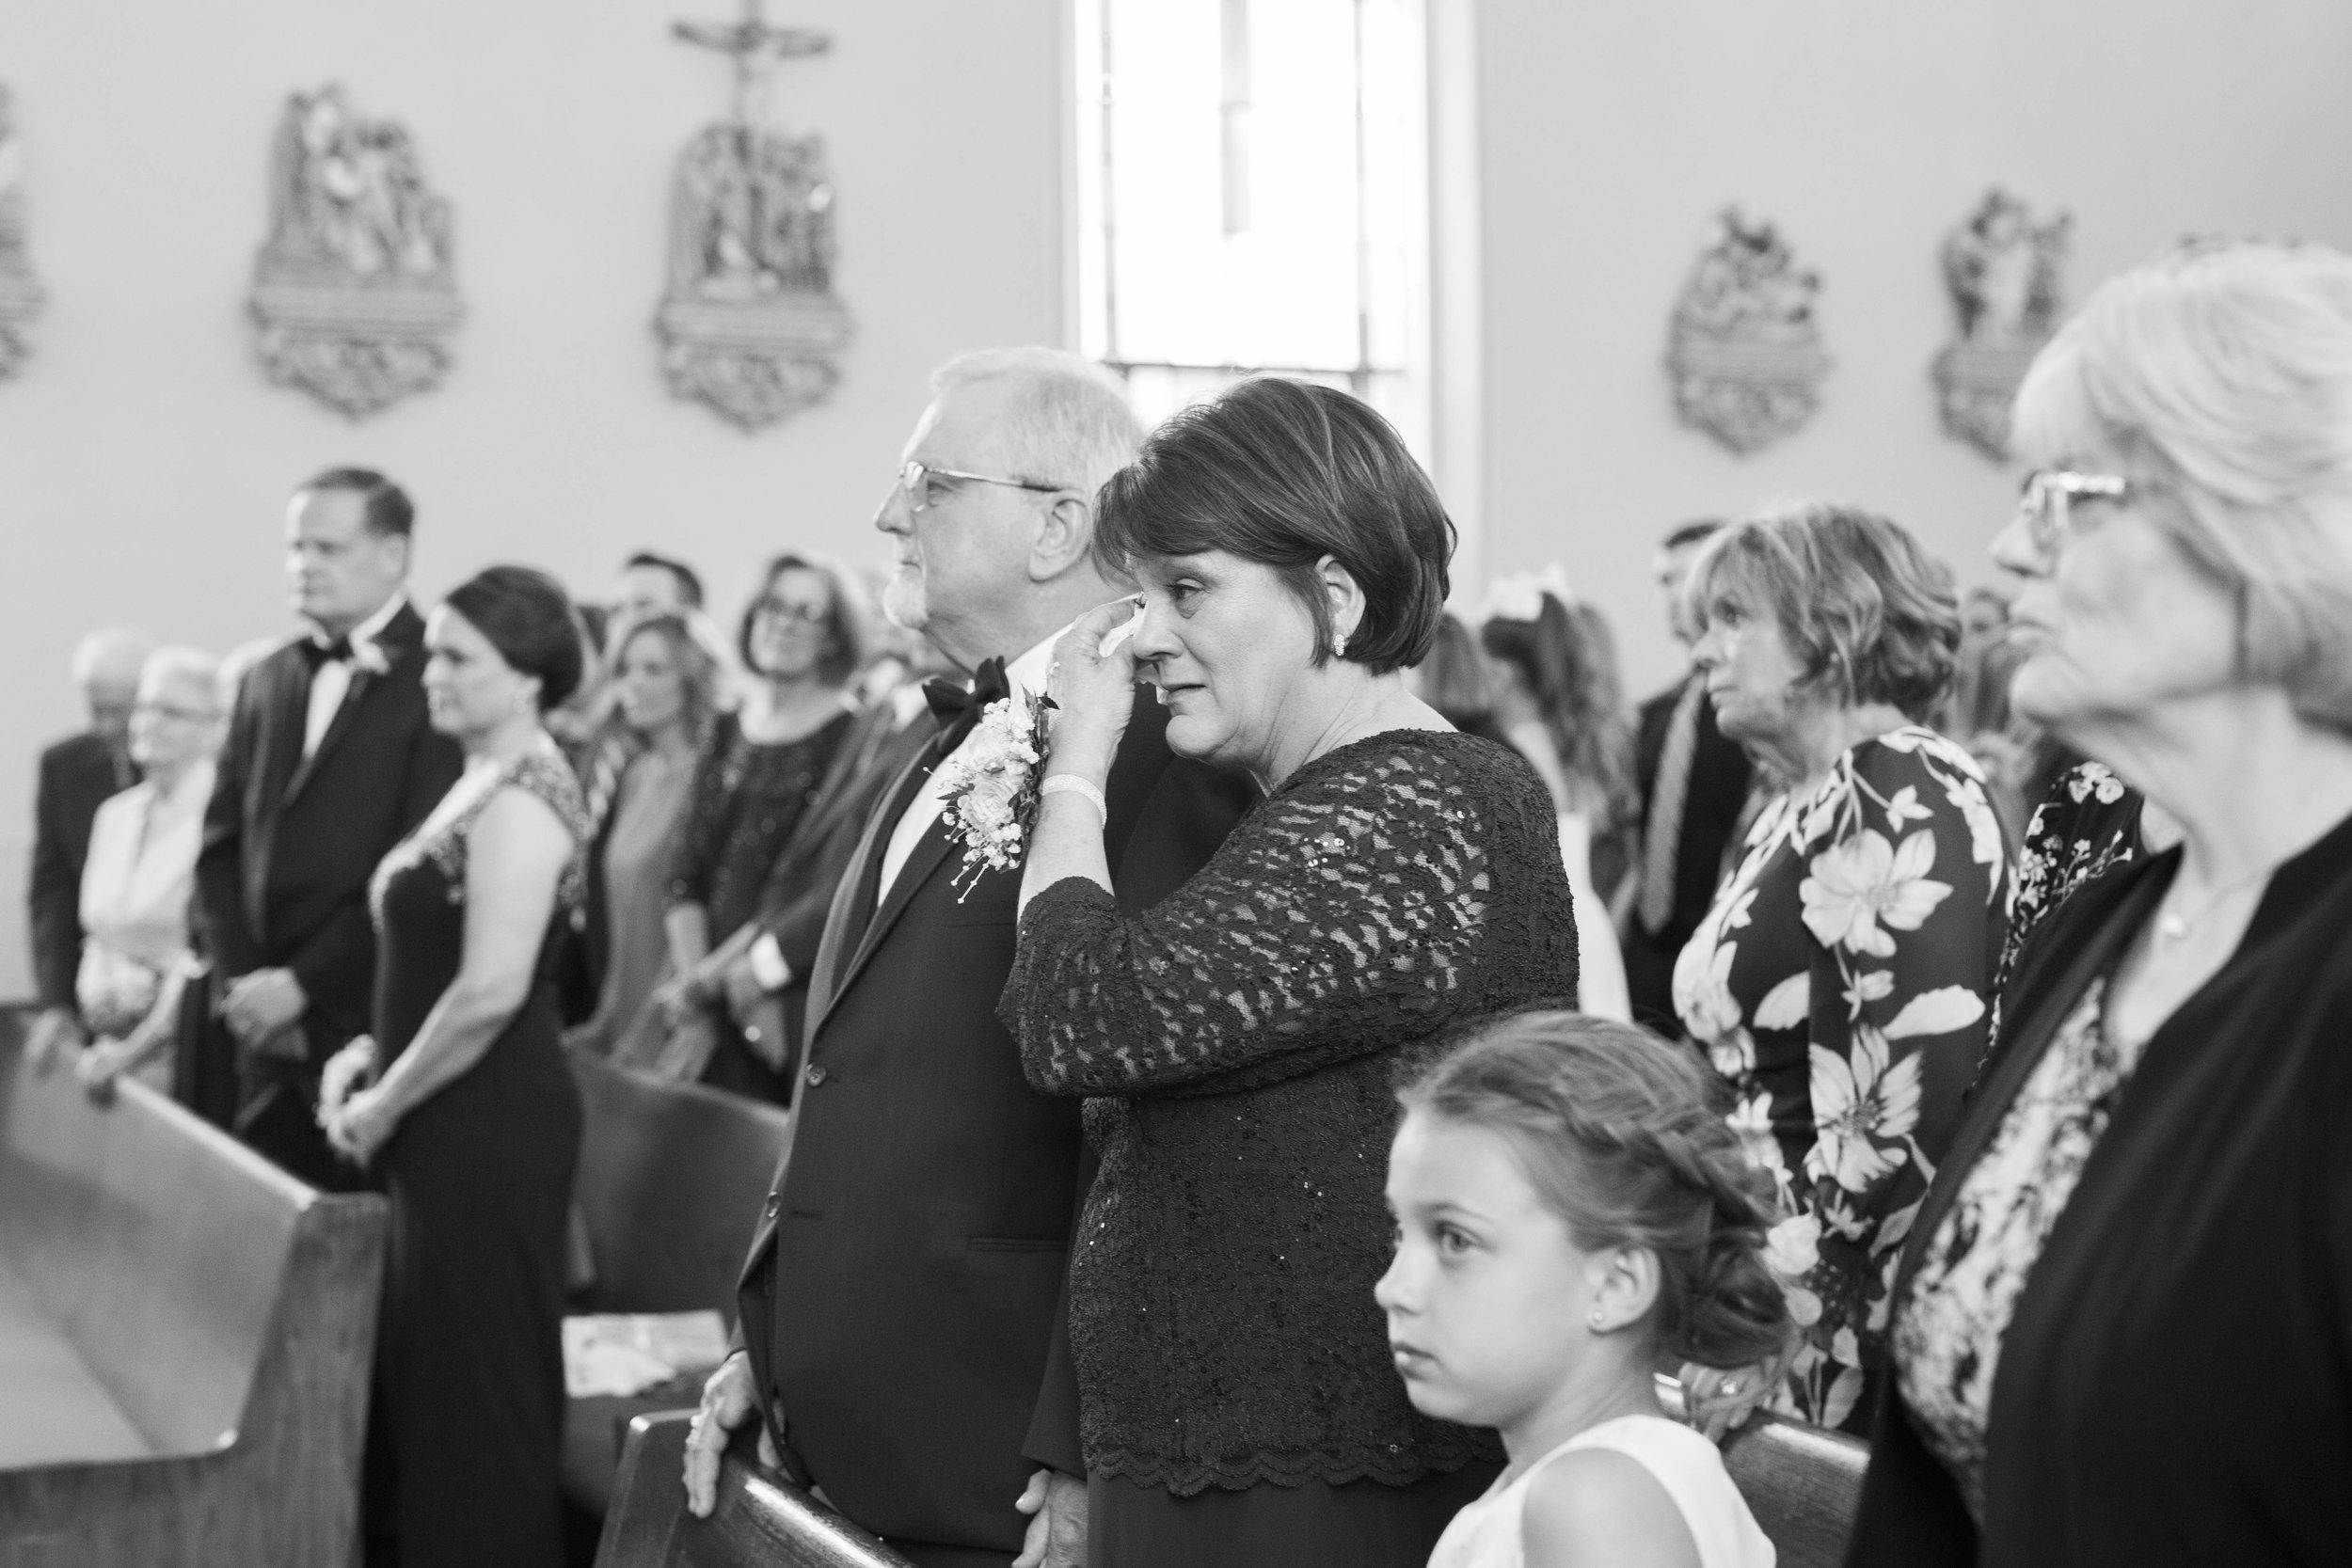 shotbychelsea_wedding_blog-16.jpg